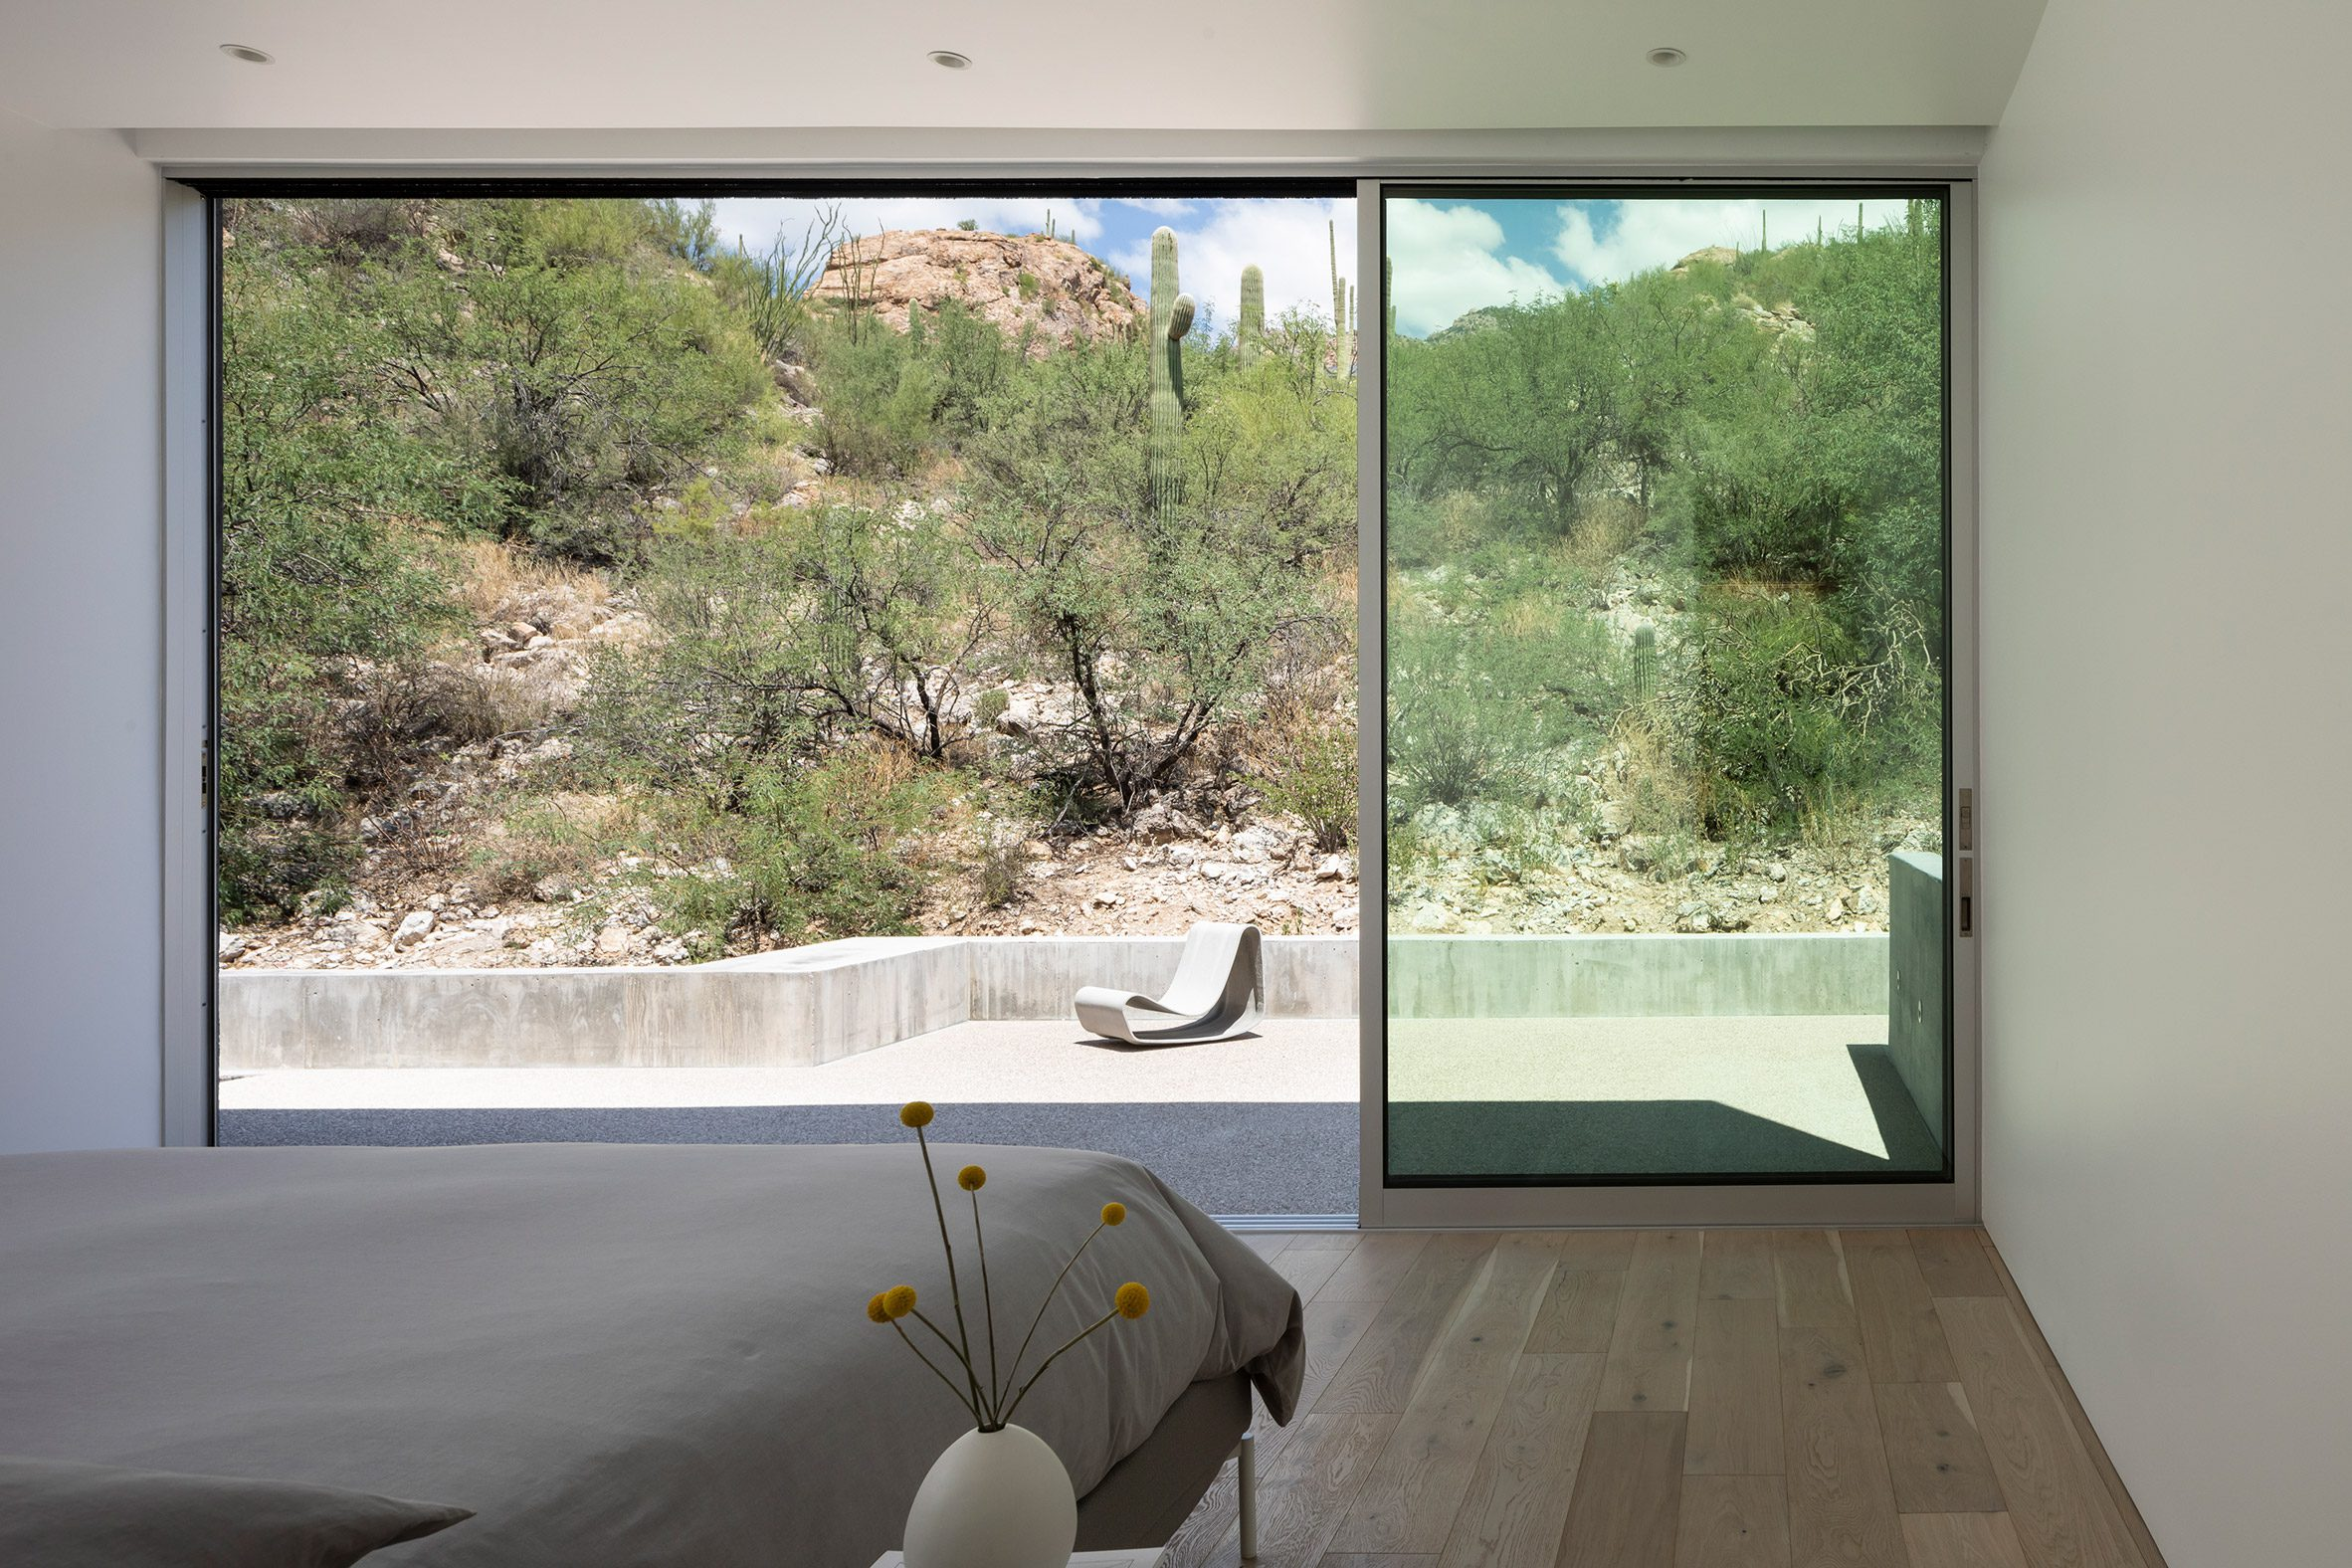 HK Associates added sliding doors to the bedroom